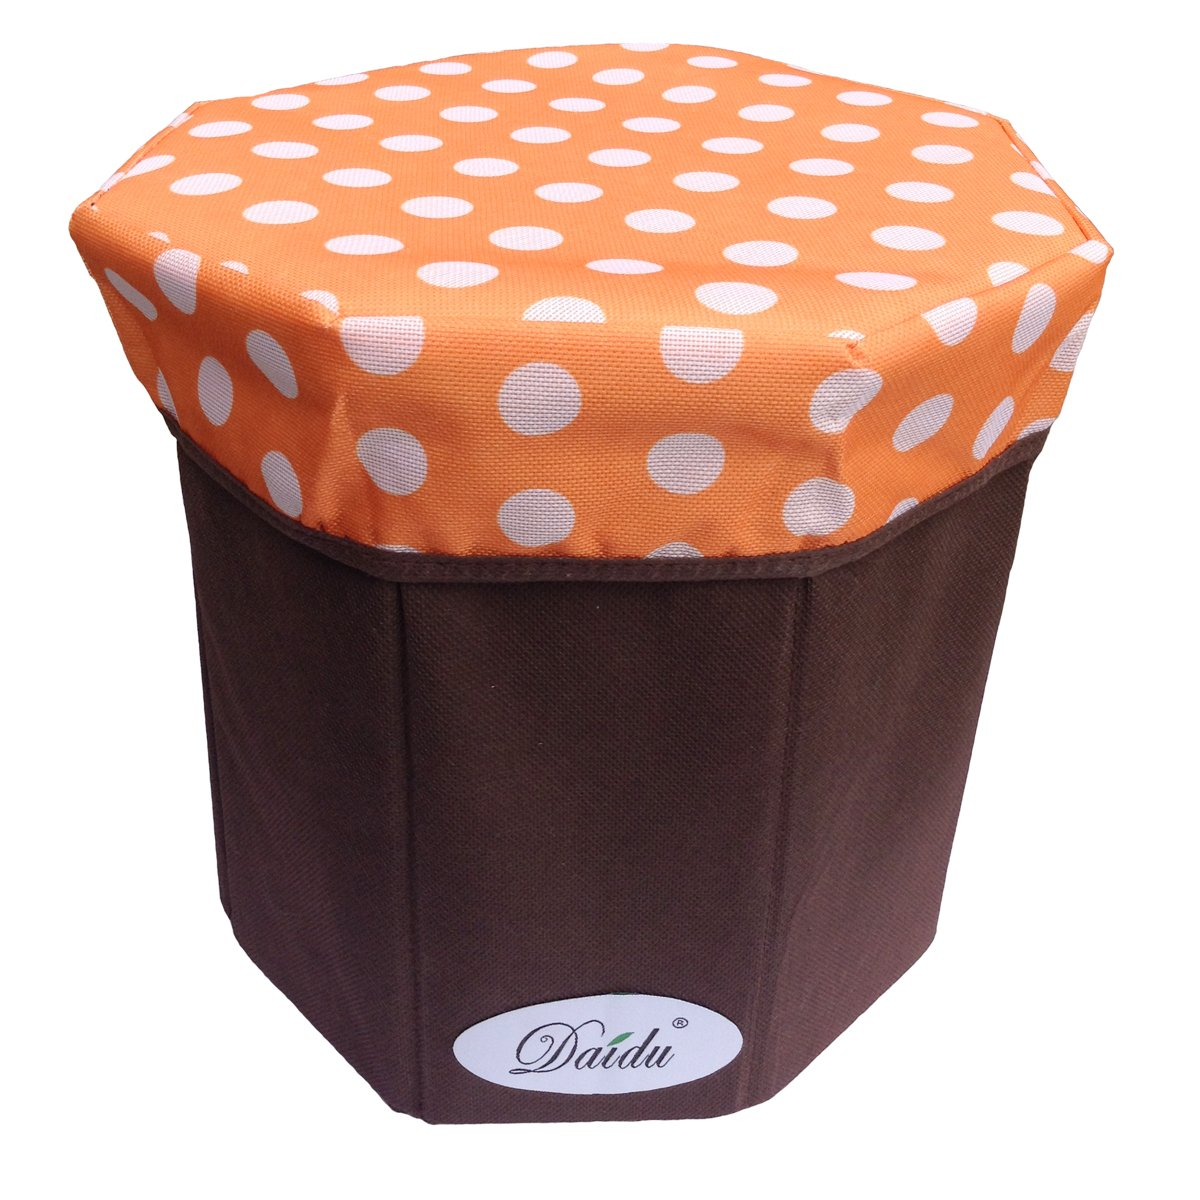 Daidu Non-Woven Fabric Foldable Storage Bin Box Organizer Ottoman Stool 9.8 x 9.8 x 9.8 inches Kid Student Pupil Desk Bedroom Dorm,Orange